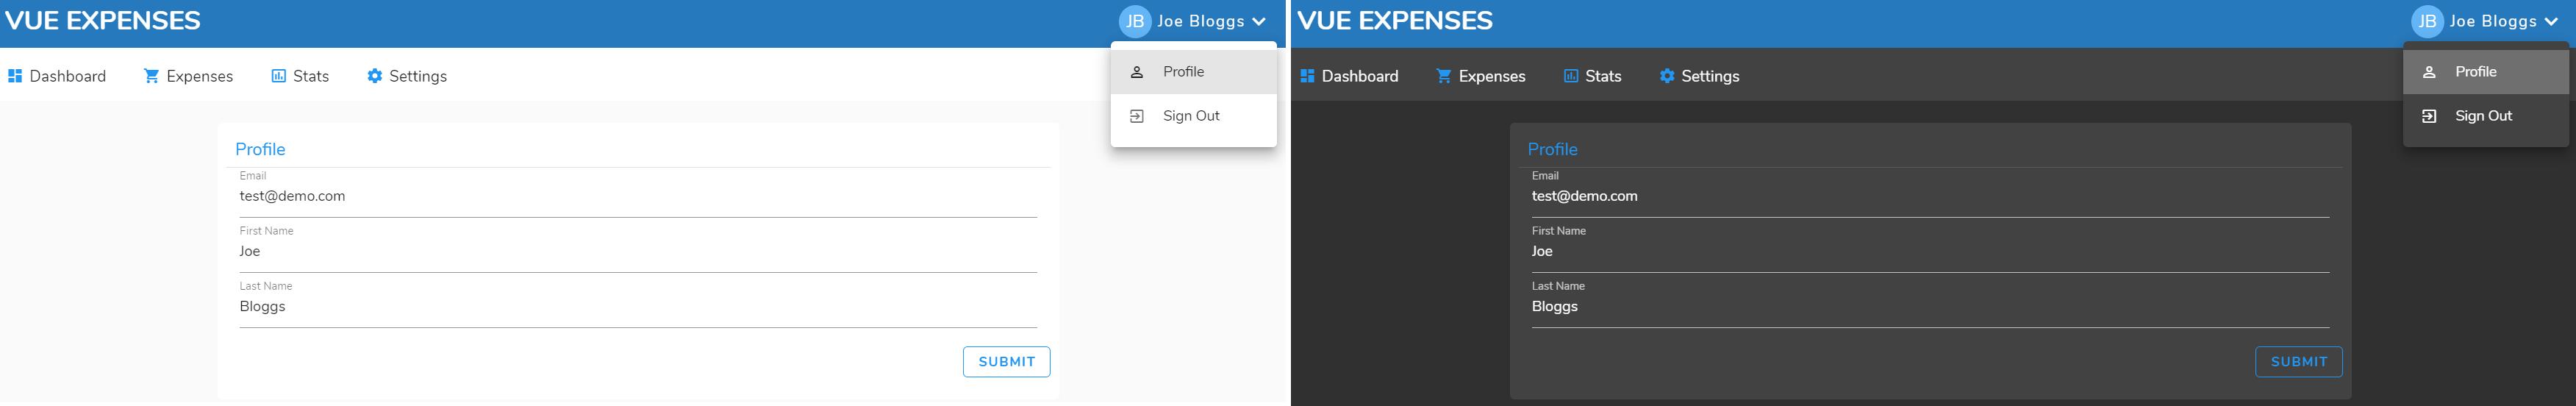 Vue Expenses Profile